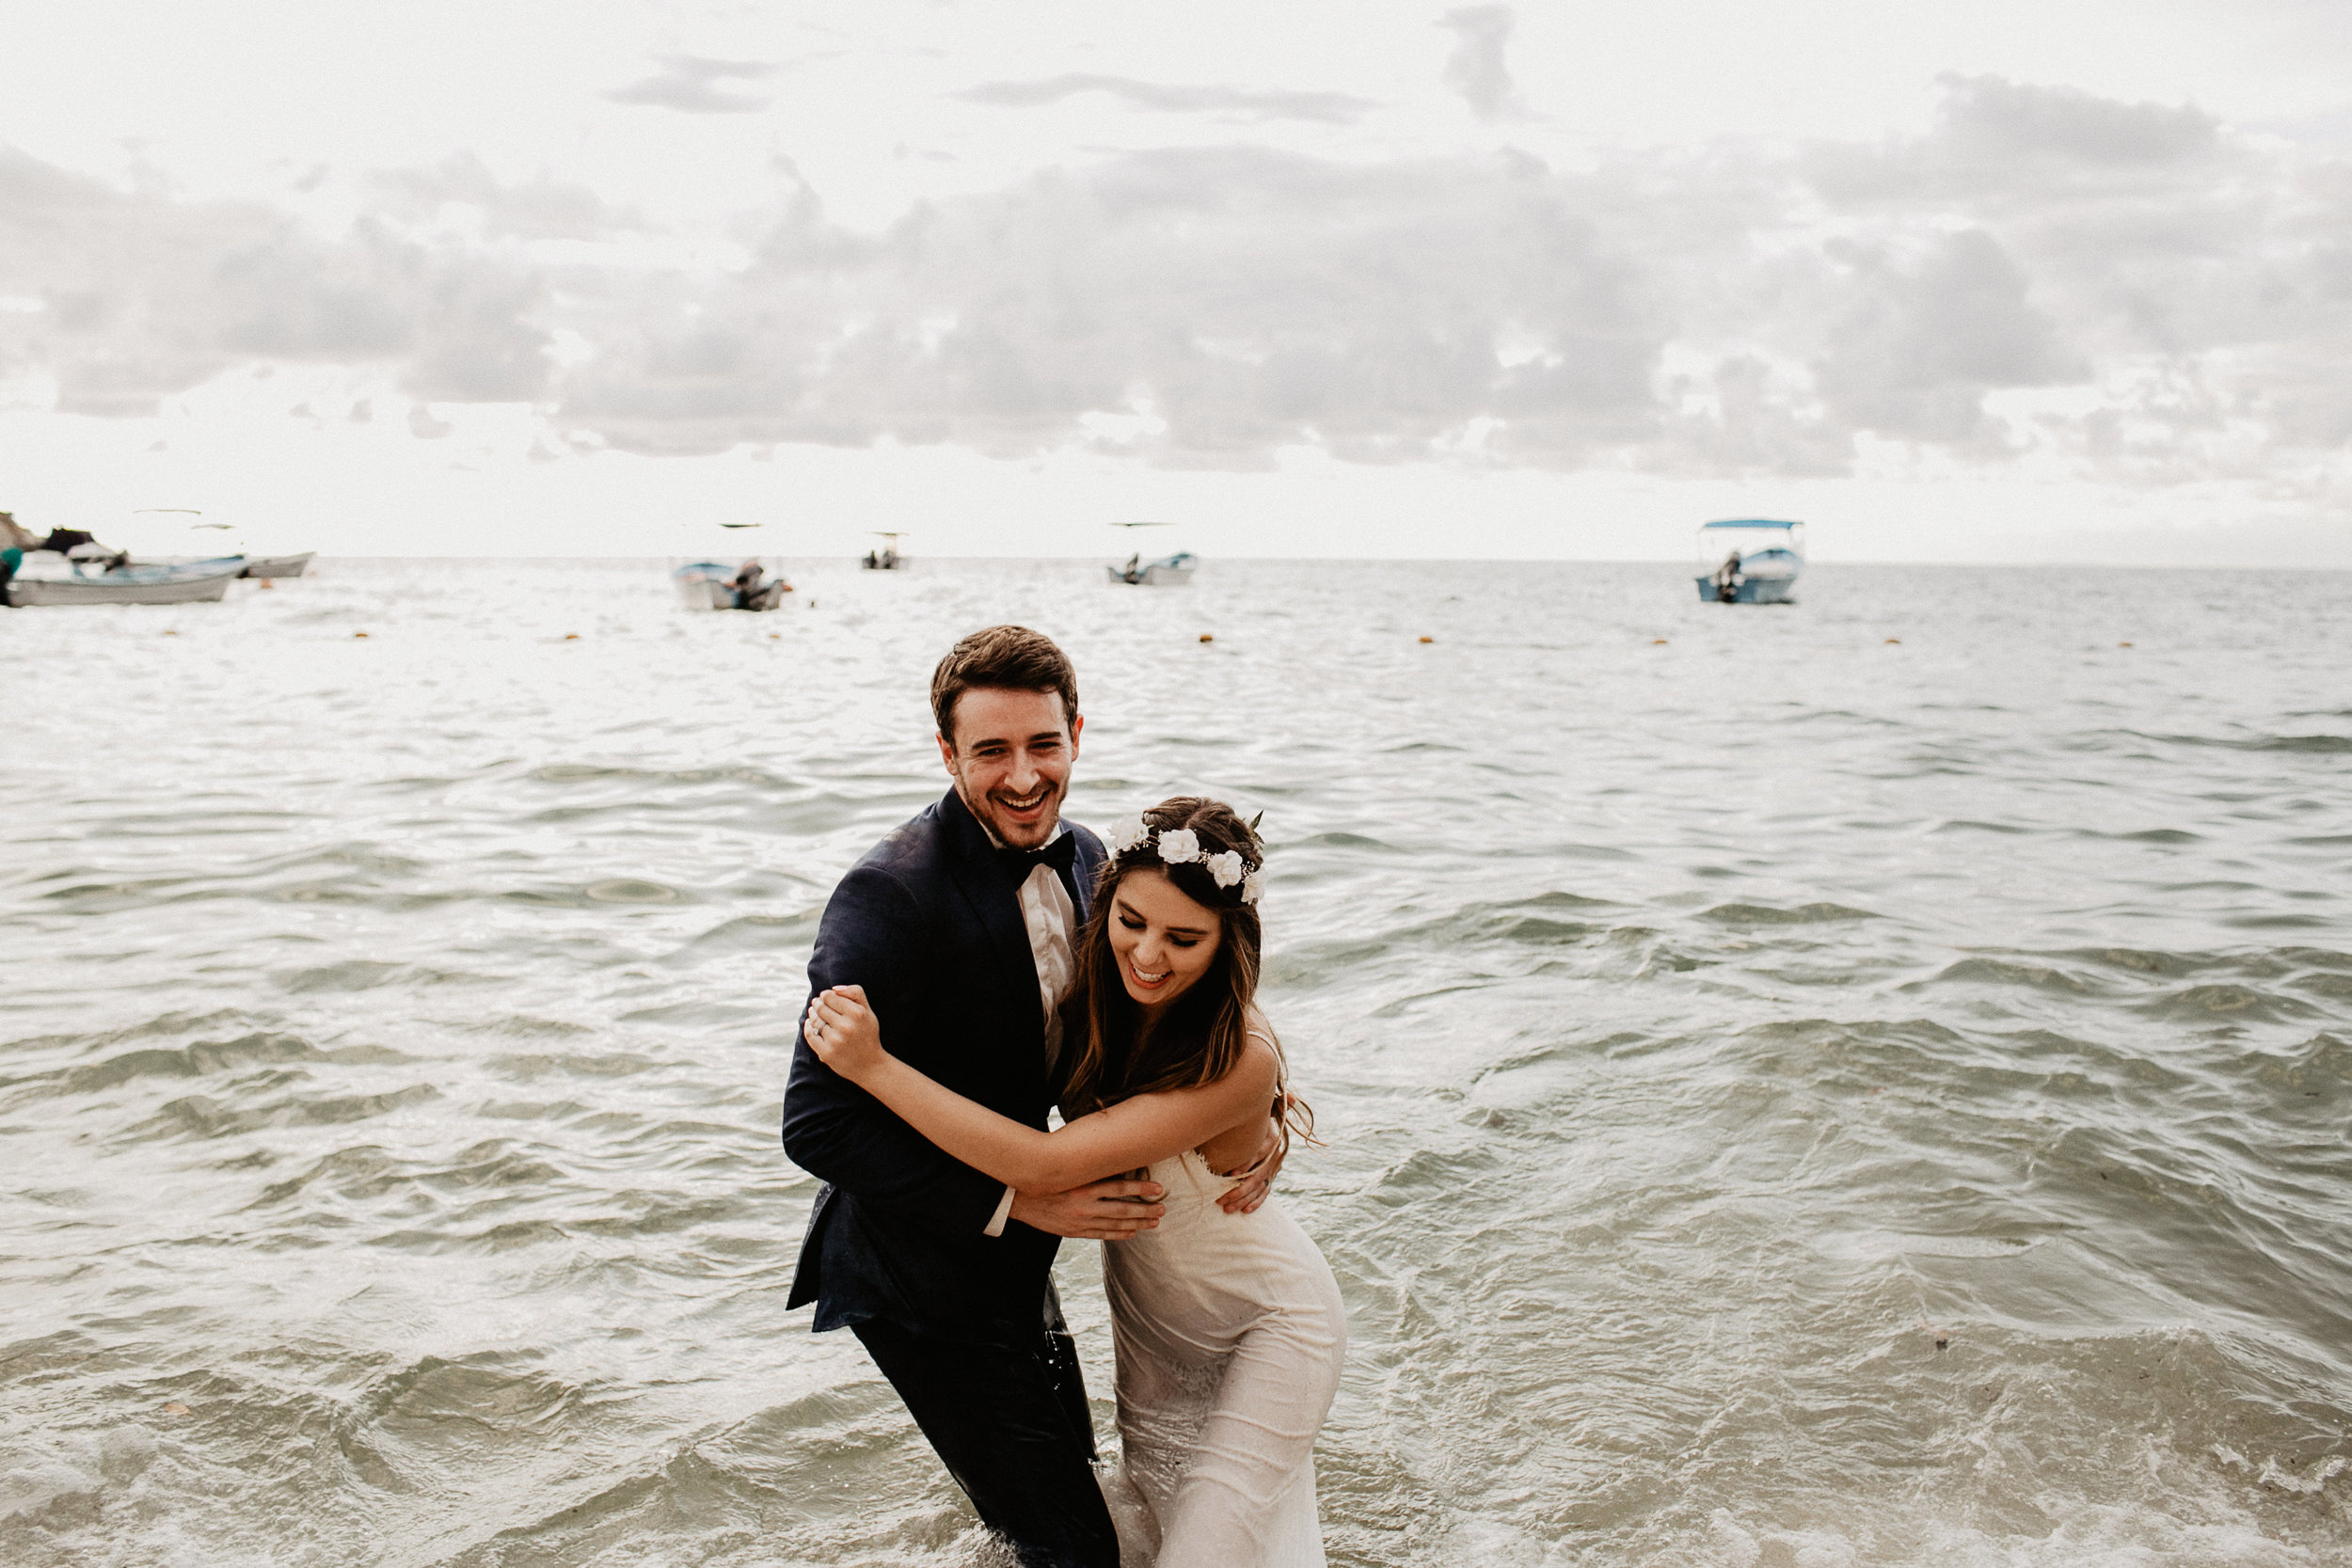 alfonso_flores_destination_wedding_photography_puerto_vallarta_hotel_barcelo_vallarta_cuttler_amela-780.JPG